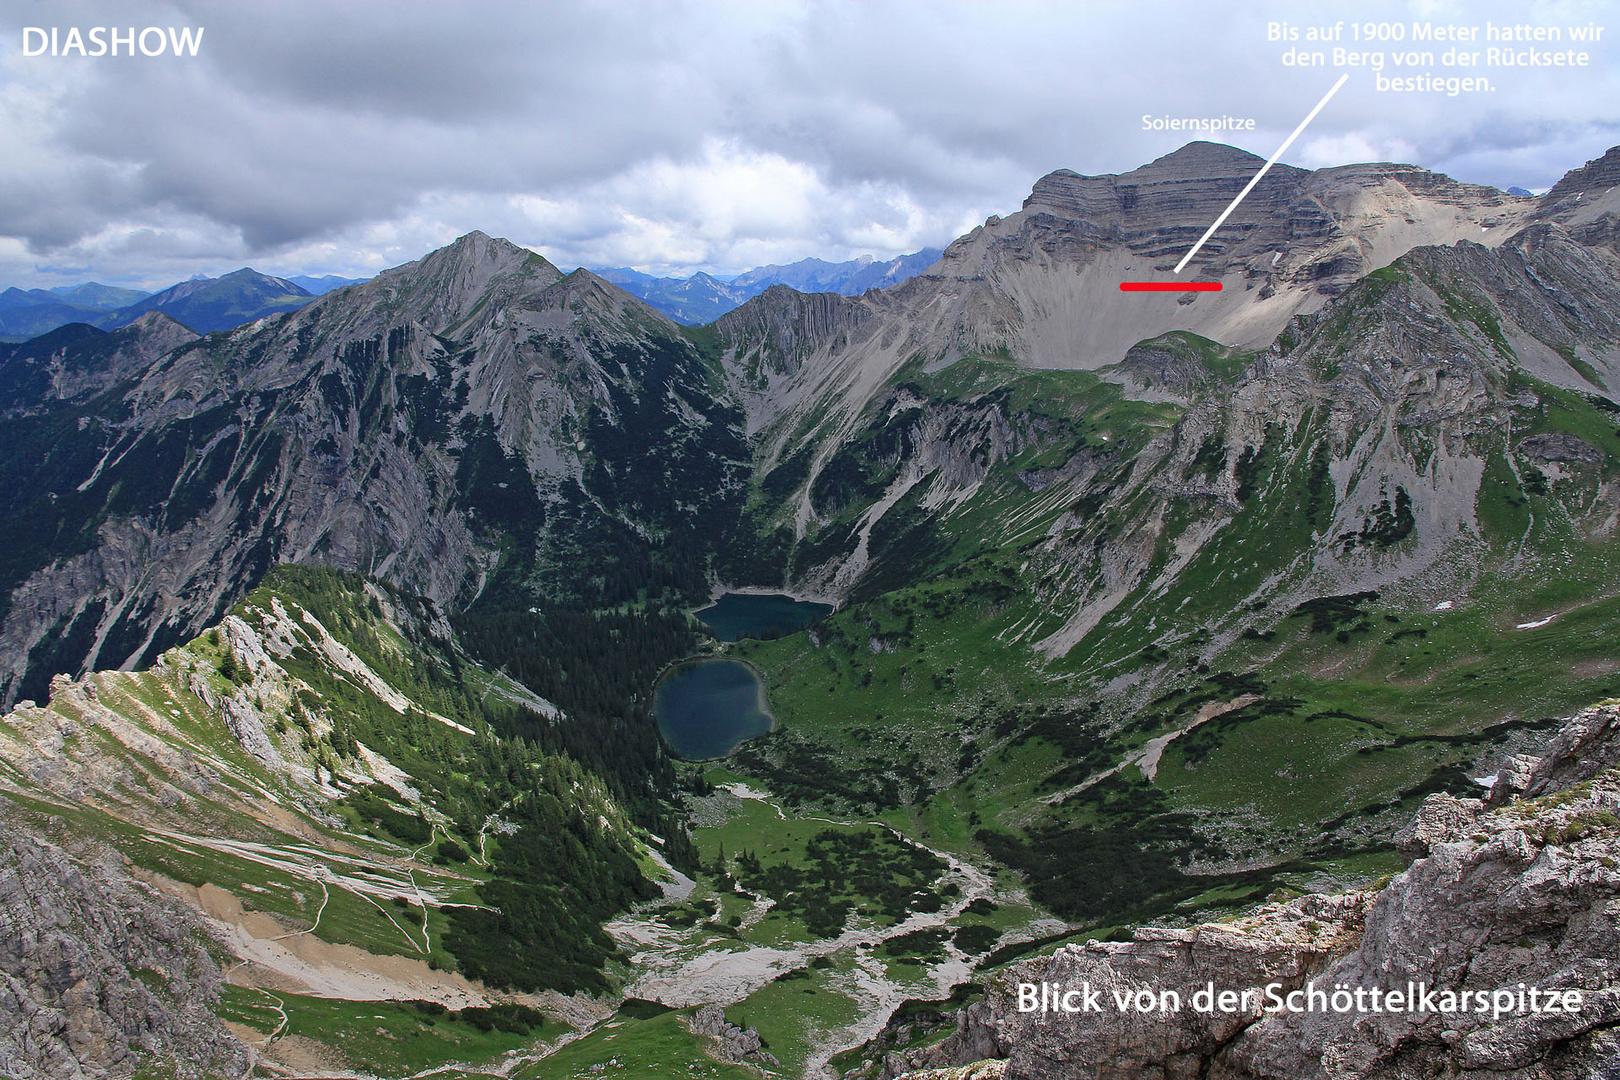 Diashow-Bergtour Soiernspitze